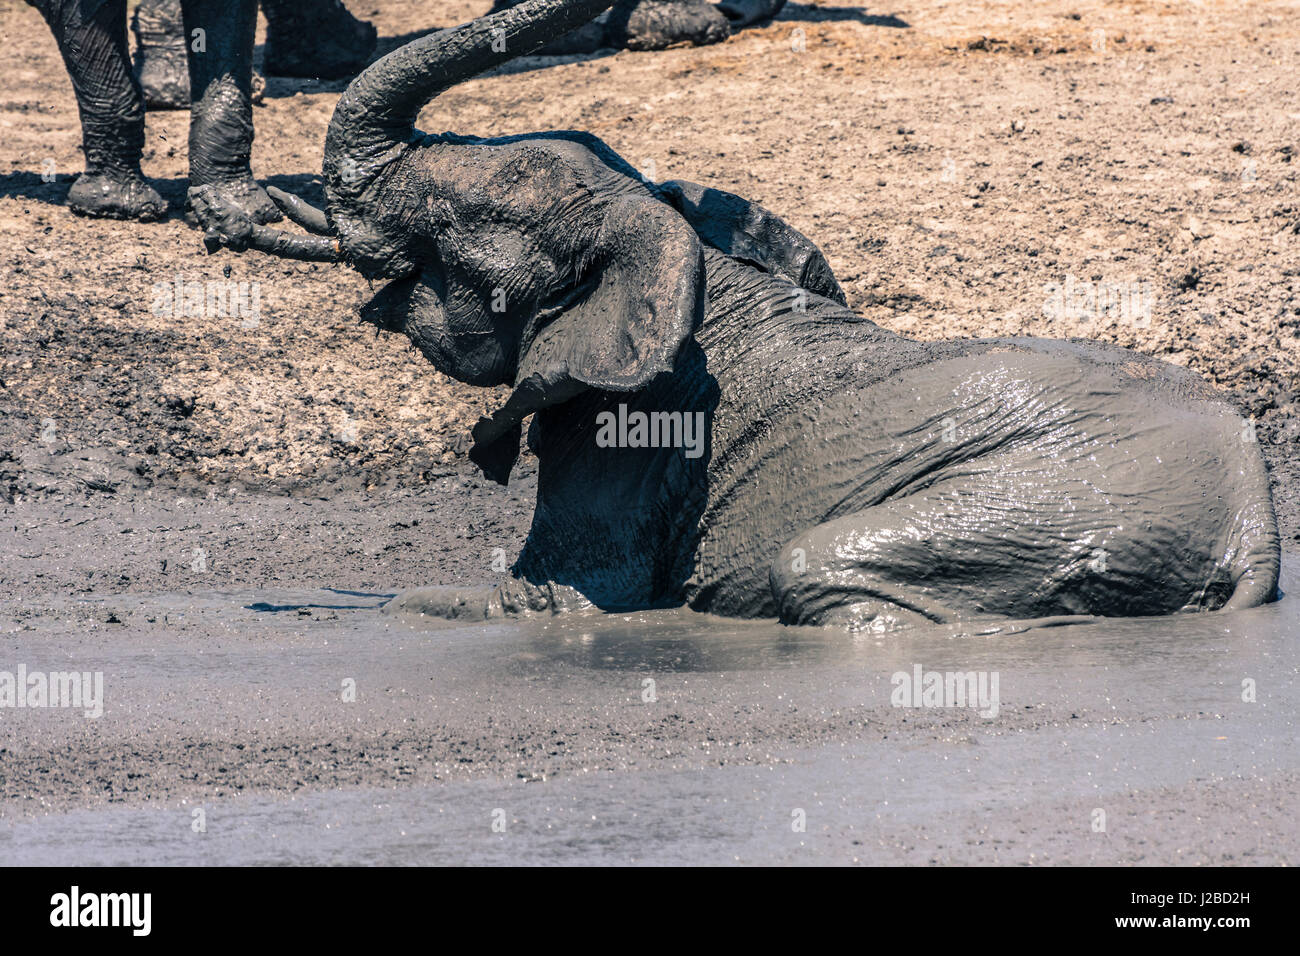 Botswana. Chobe National Park. Savuti. Elephants (Loxodonta africana) throwing mud on themselves at a mud hole. - Stock-Bilder